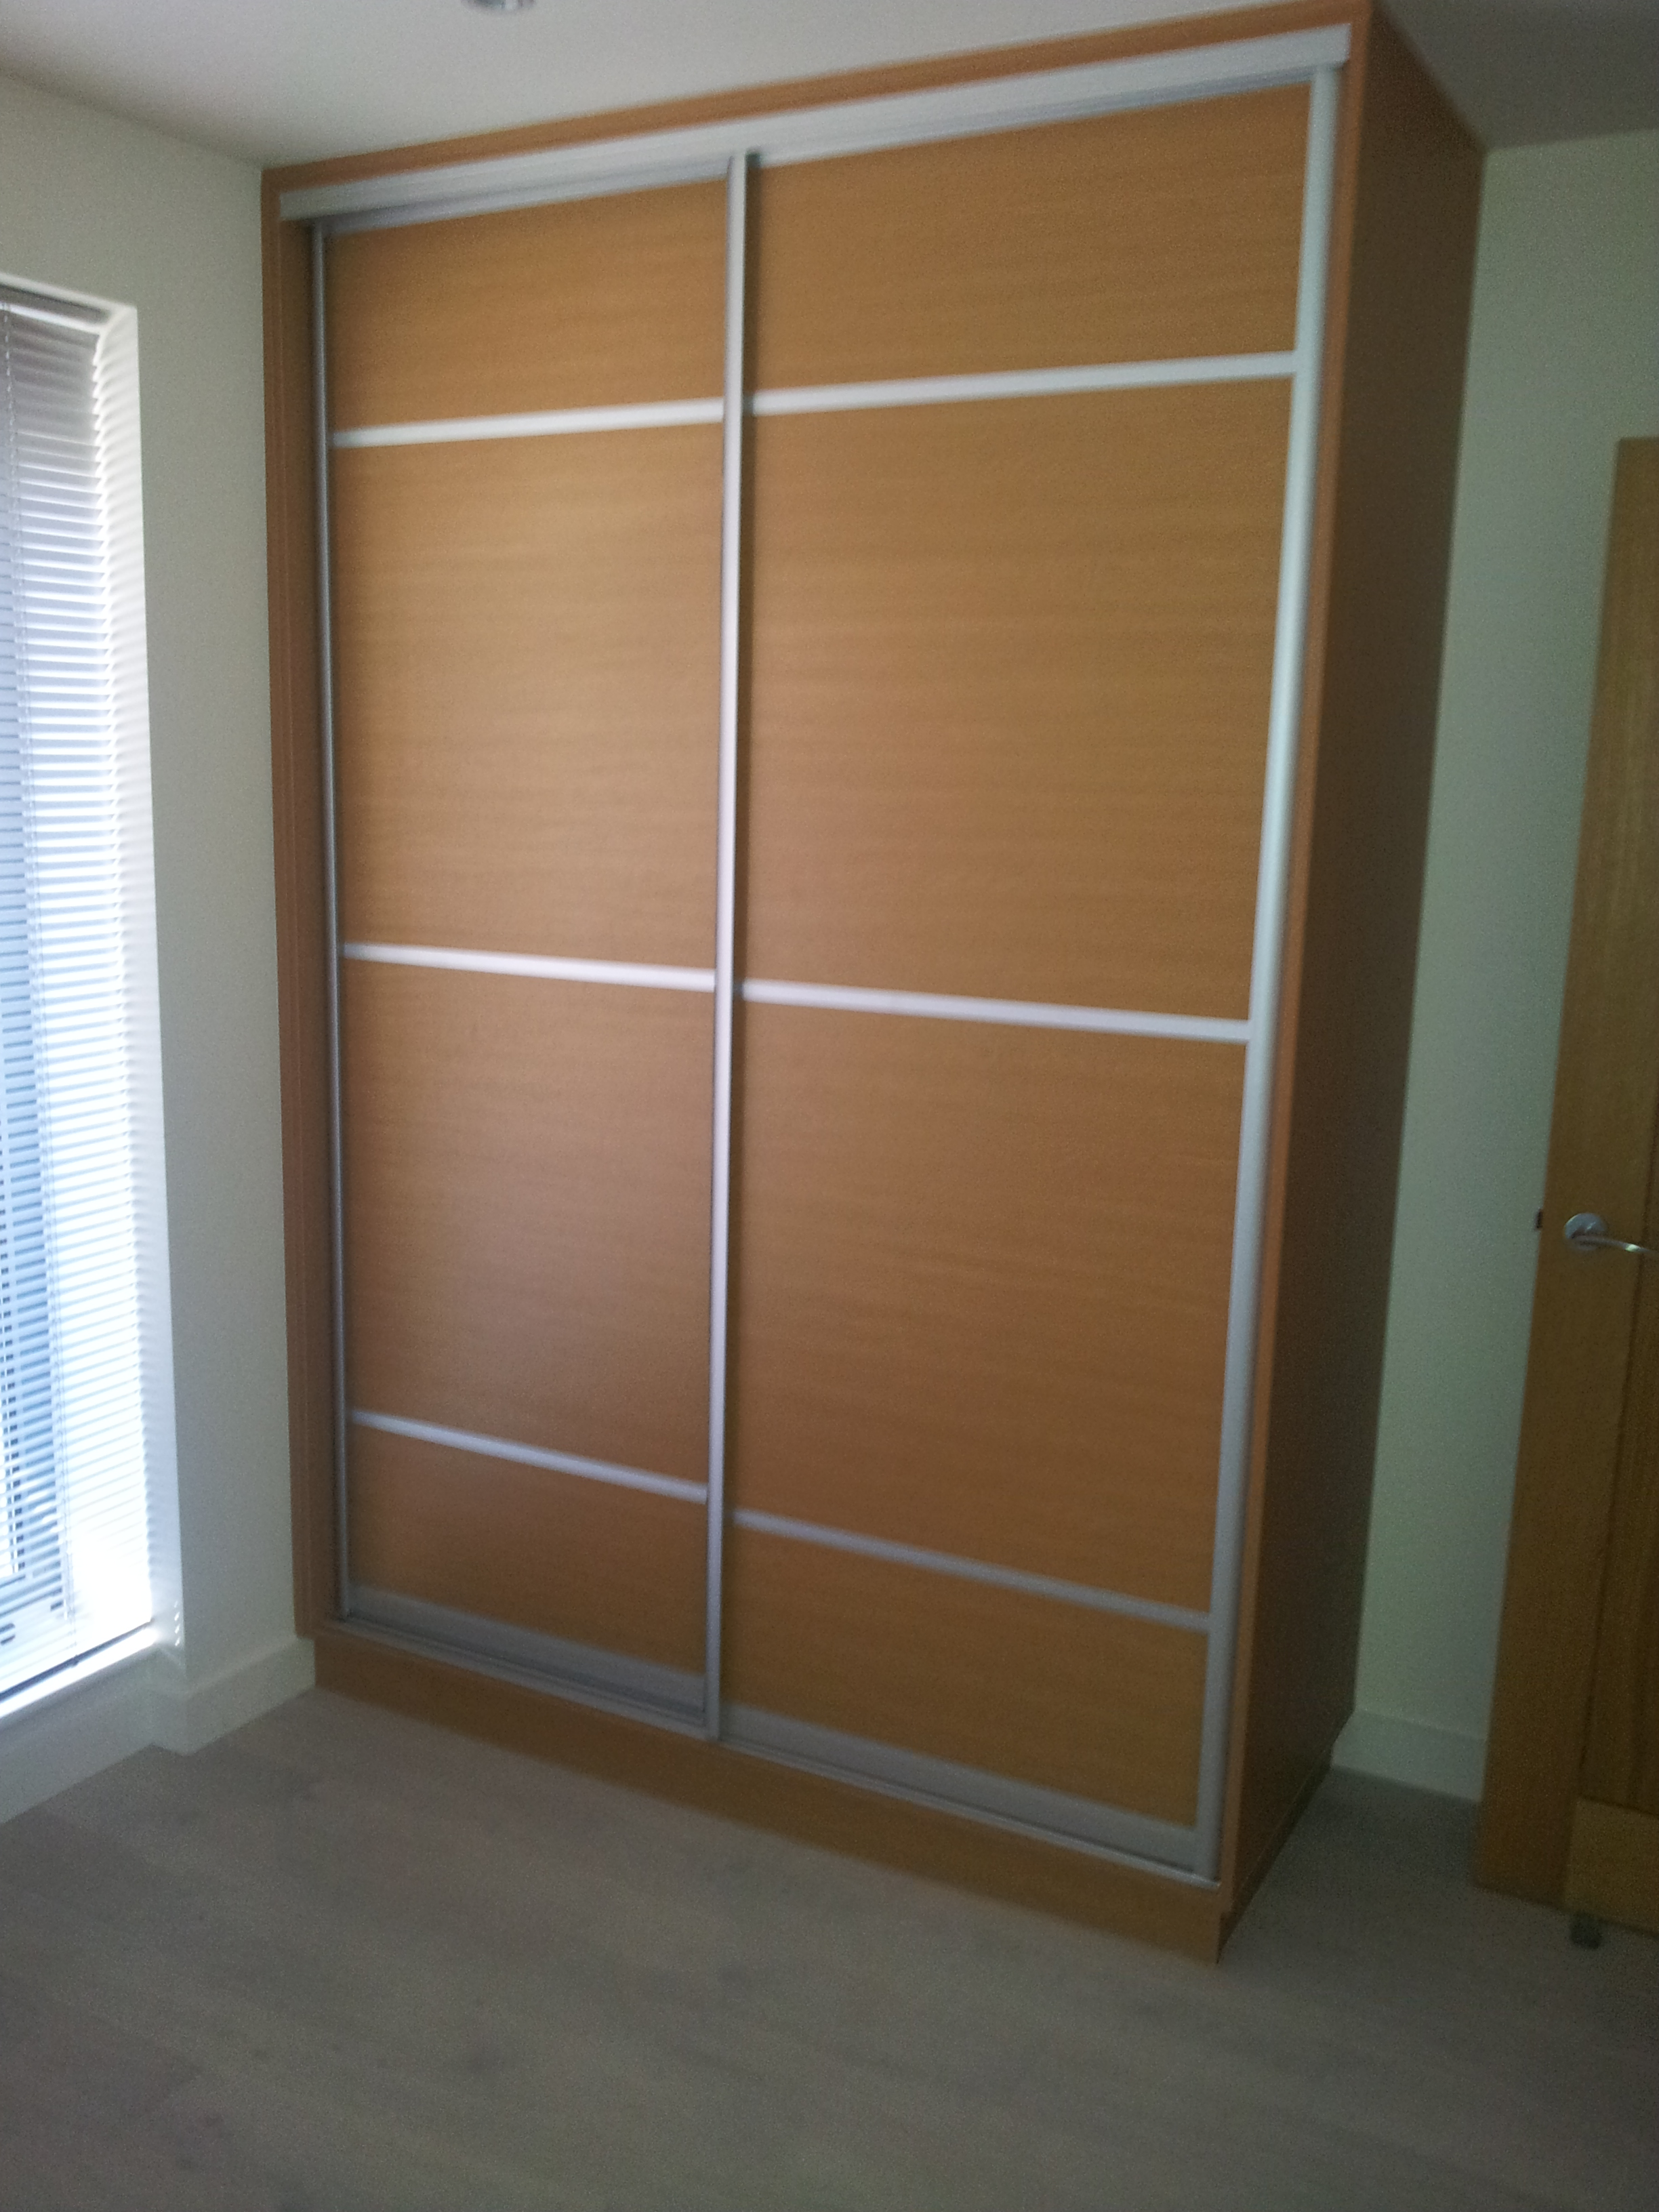 Gallery sliding wardrobes sliding doors for sale for Sliding doors for sale